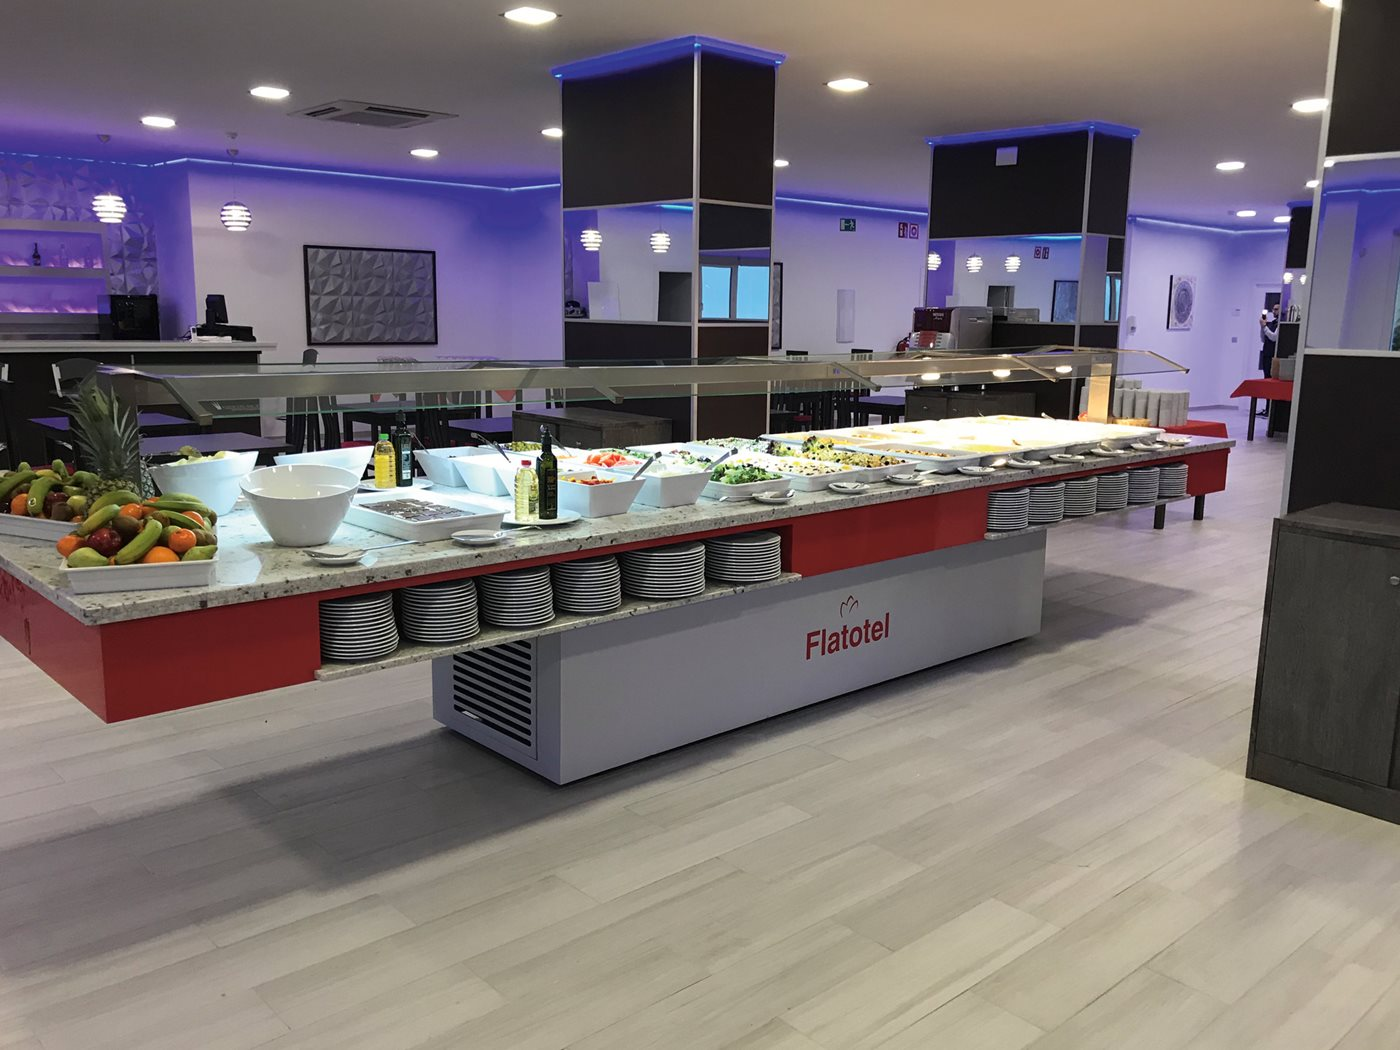 Restaurants and bars - First Flatotel Apartments - Benalmadena | Transat